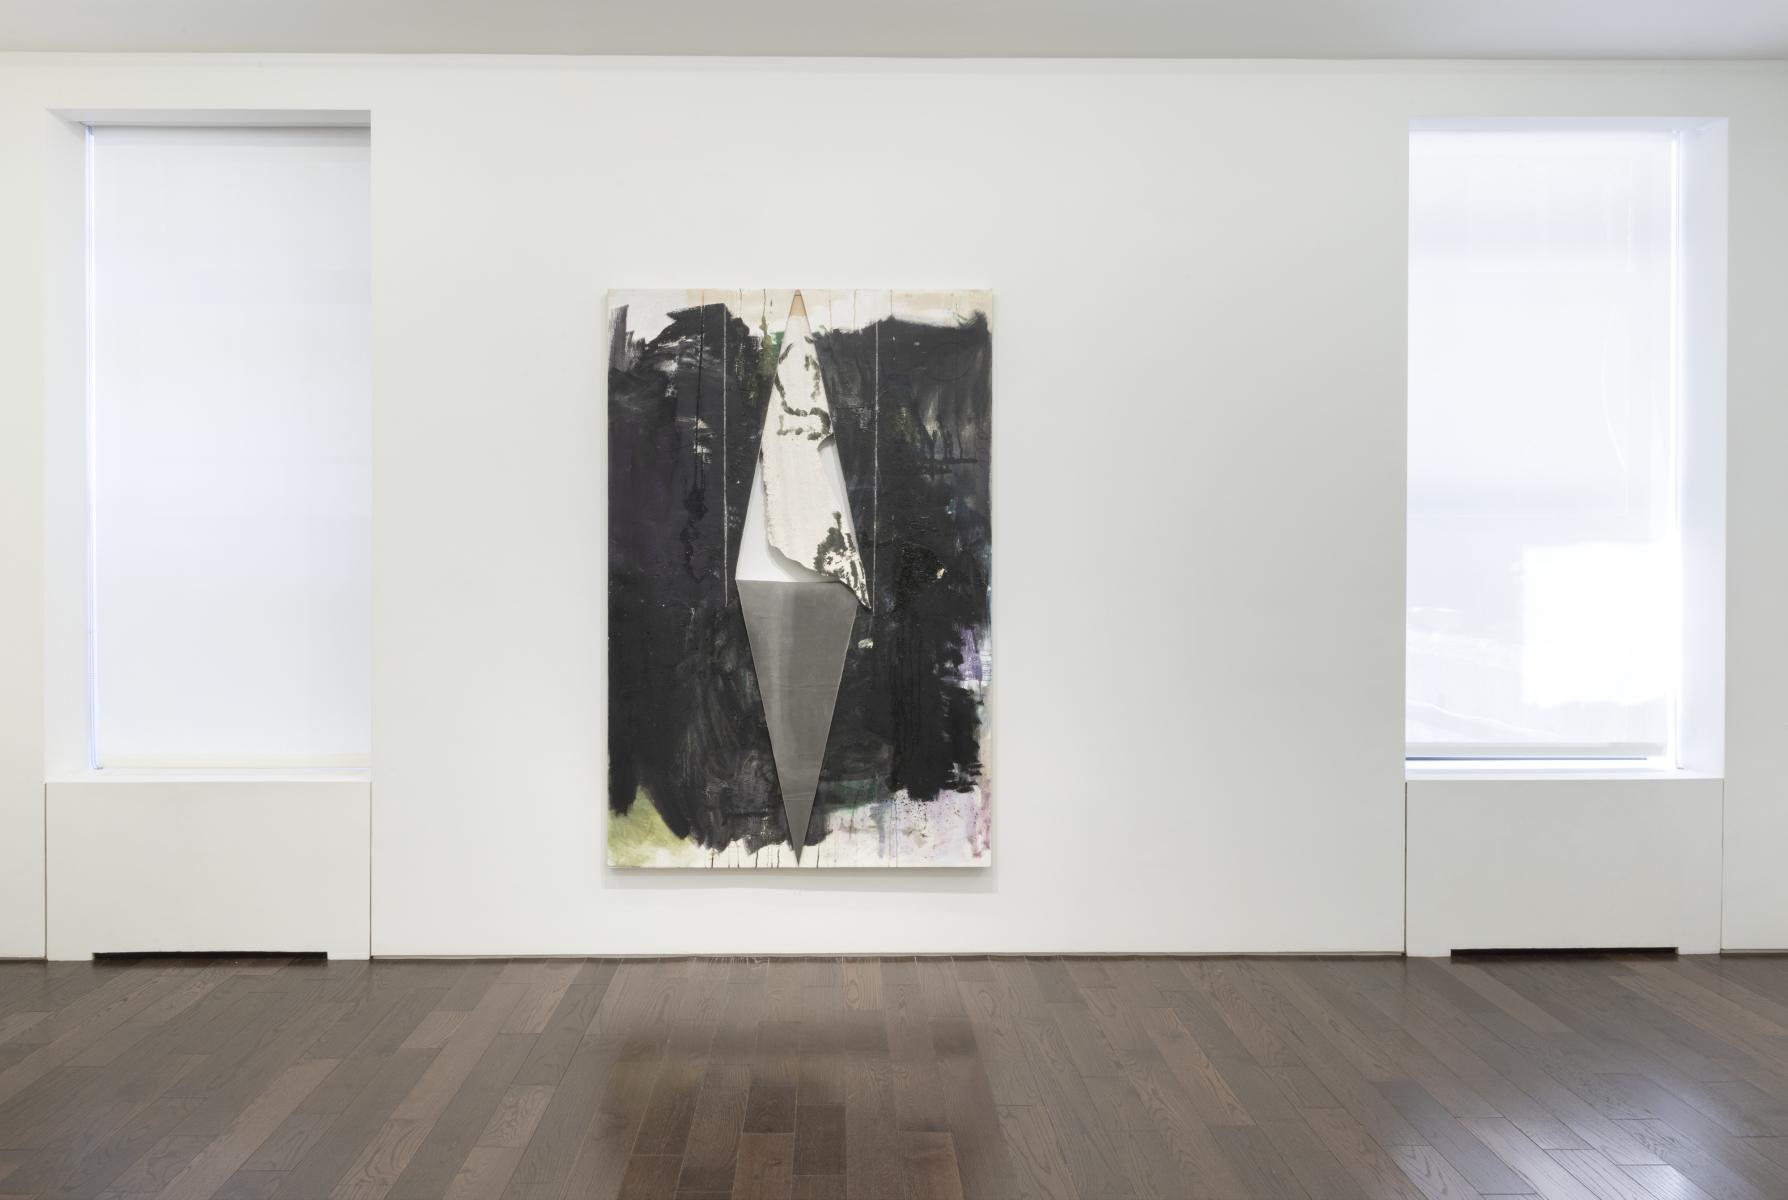 Exhibition View Wrecked Angle Ceysson & Bénétière New York 2021 (10)